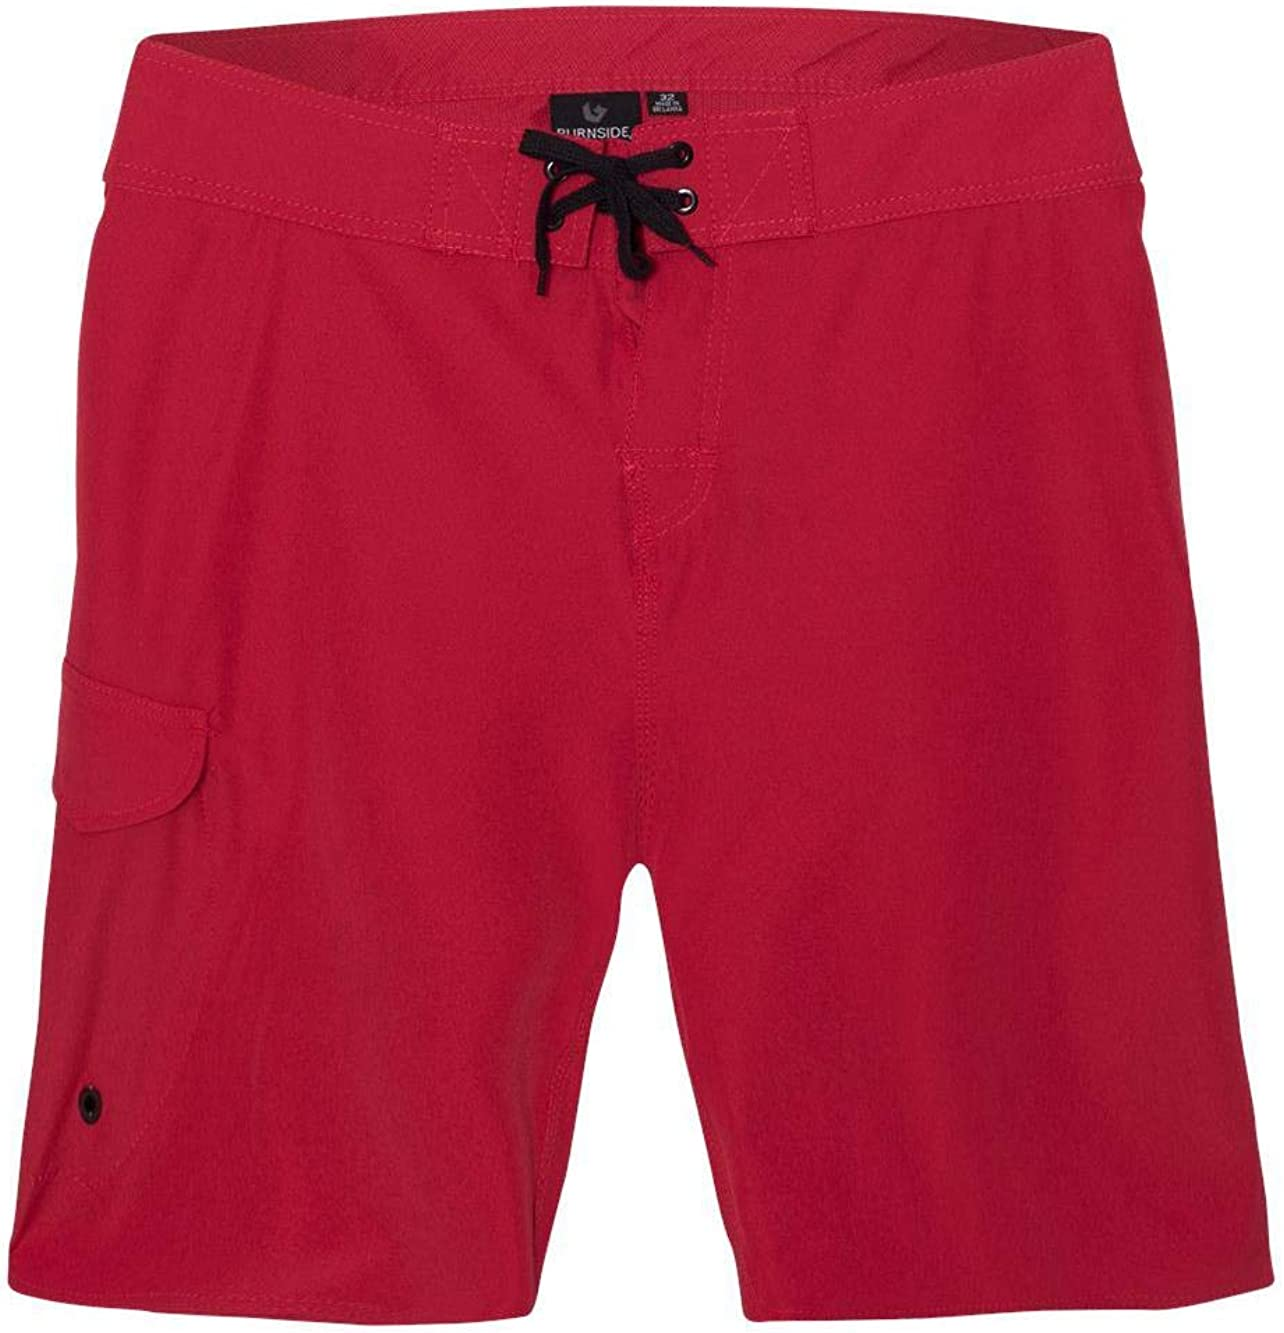 9371 Burnside Mens Diamond Dobby Board Shorts